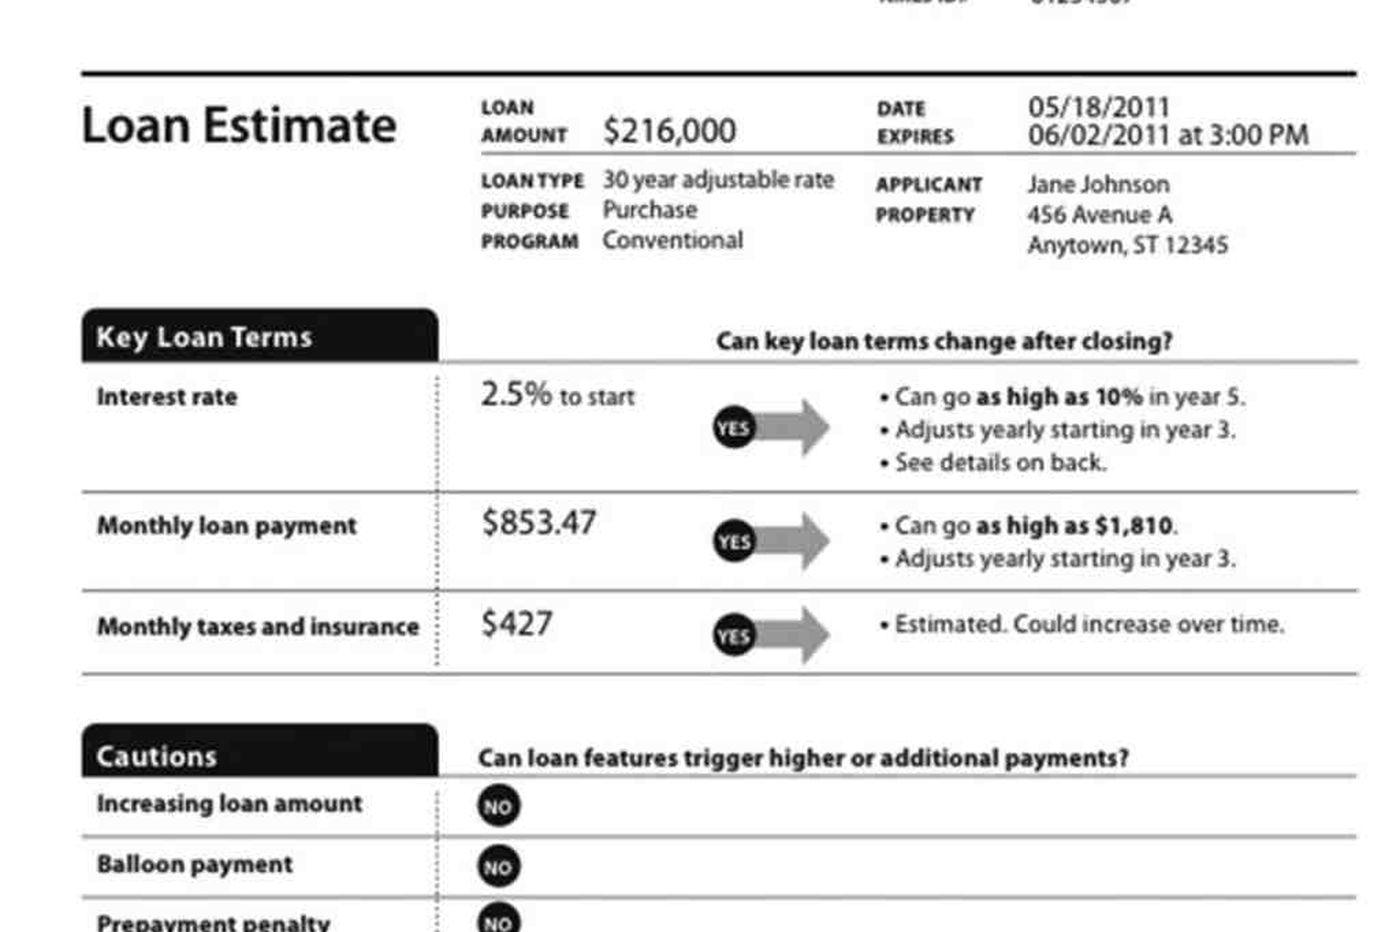 Feds test simpler mortgage disclosure forms